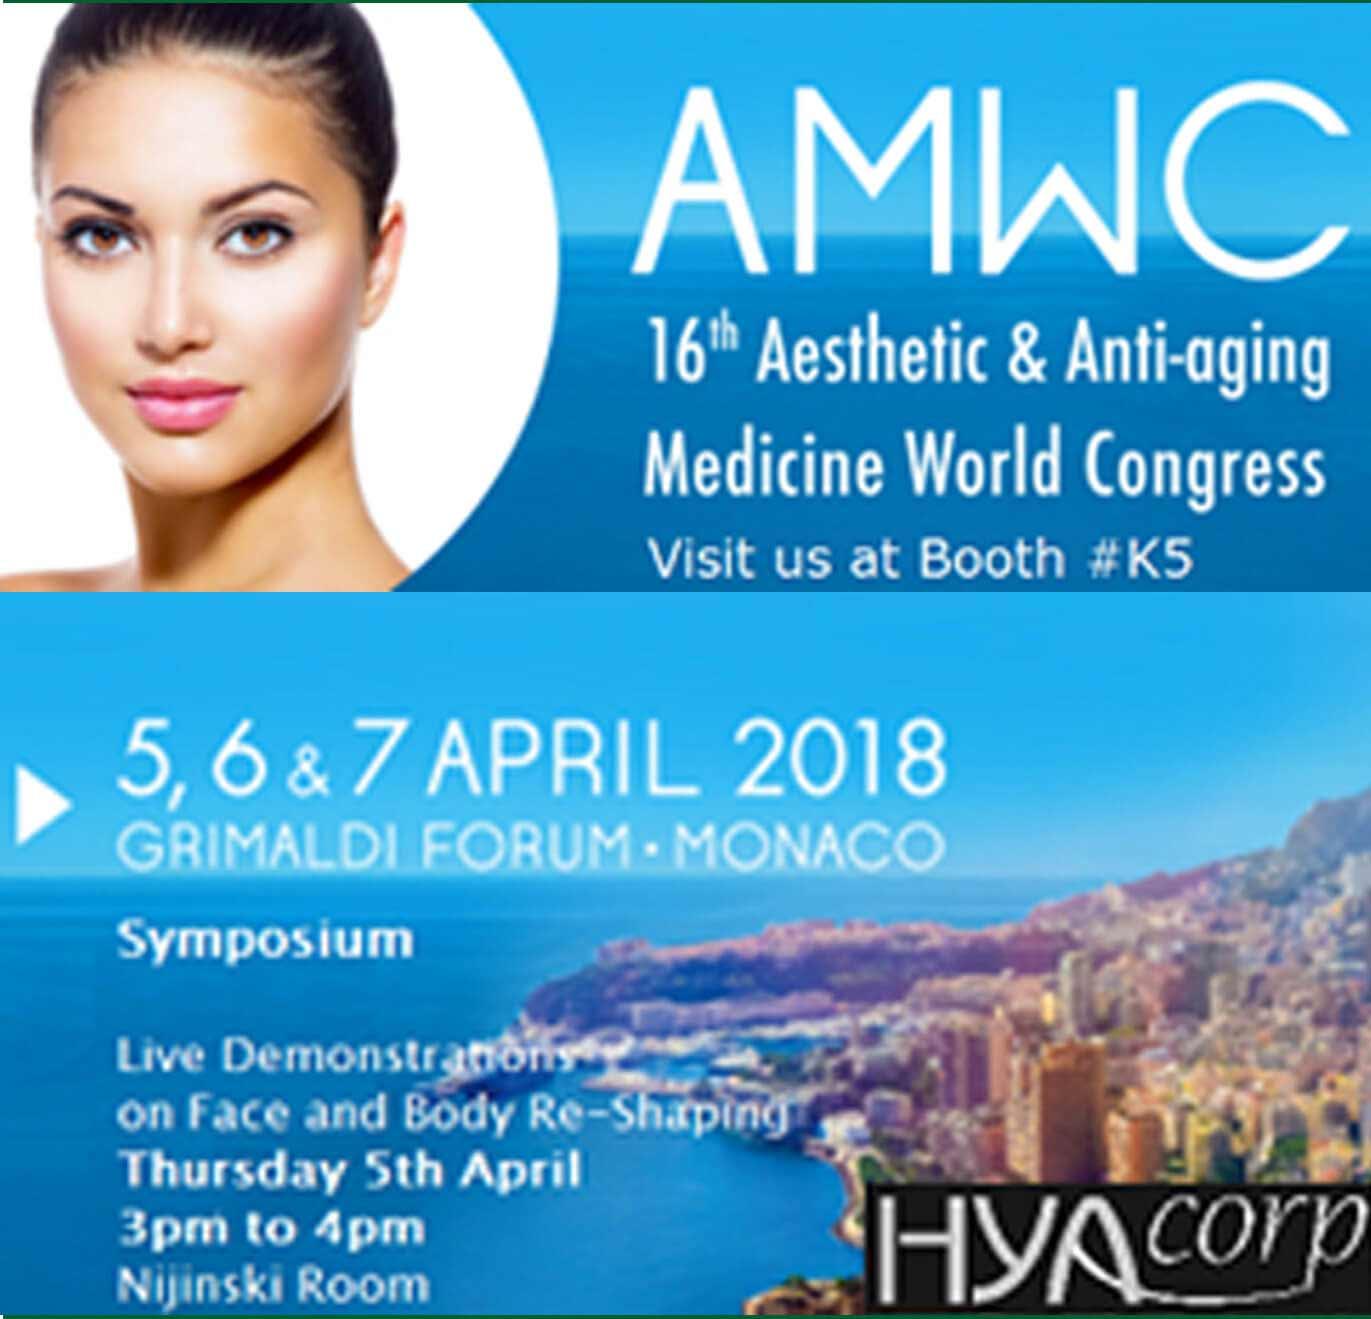 AMWC evenement